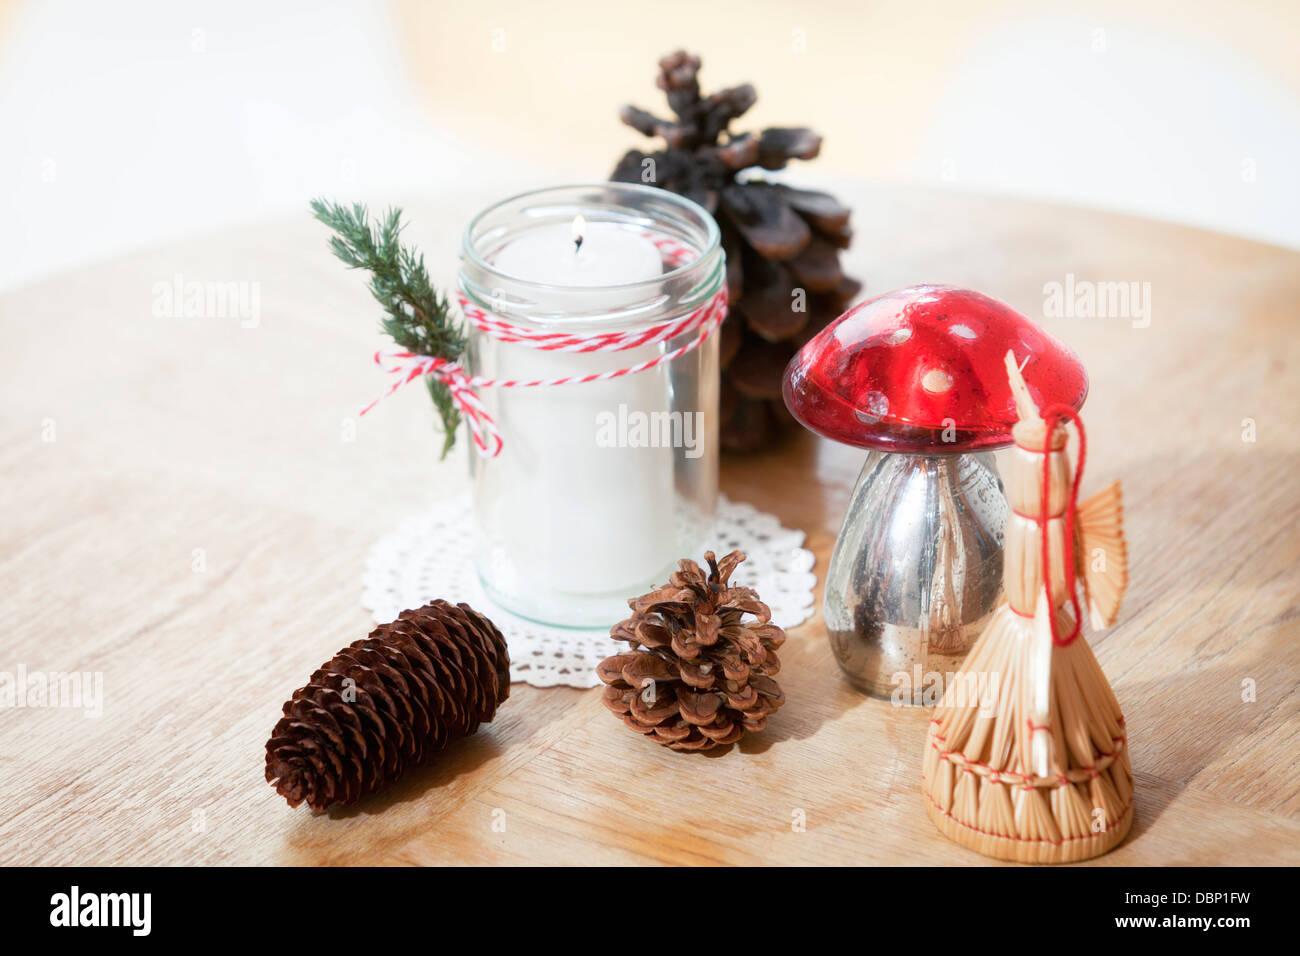 Variety of Christmas ornaments, Munich, Bavaria, Germany - Stock Image